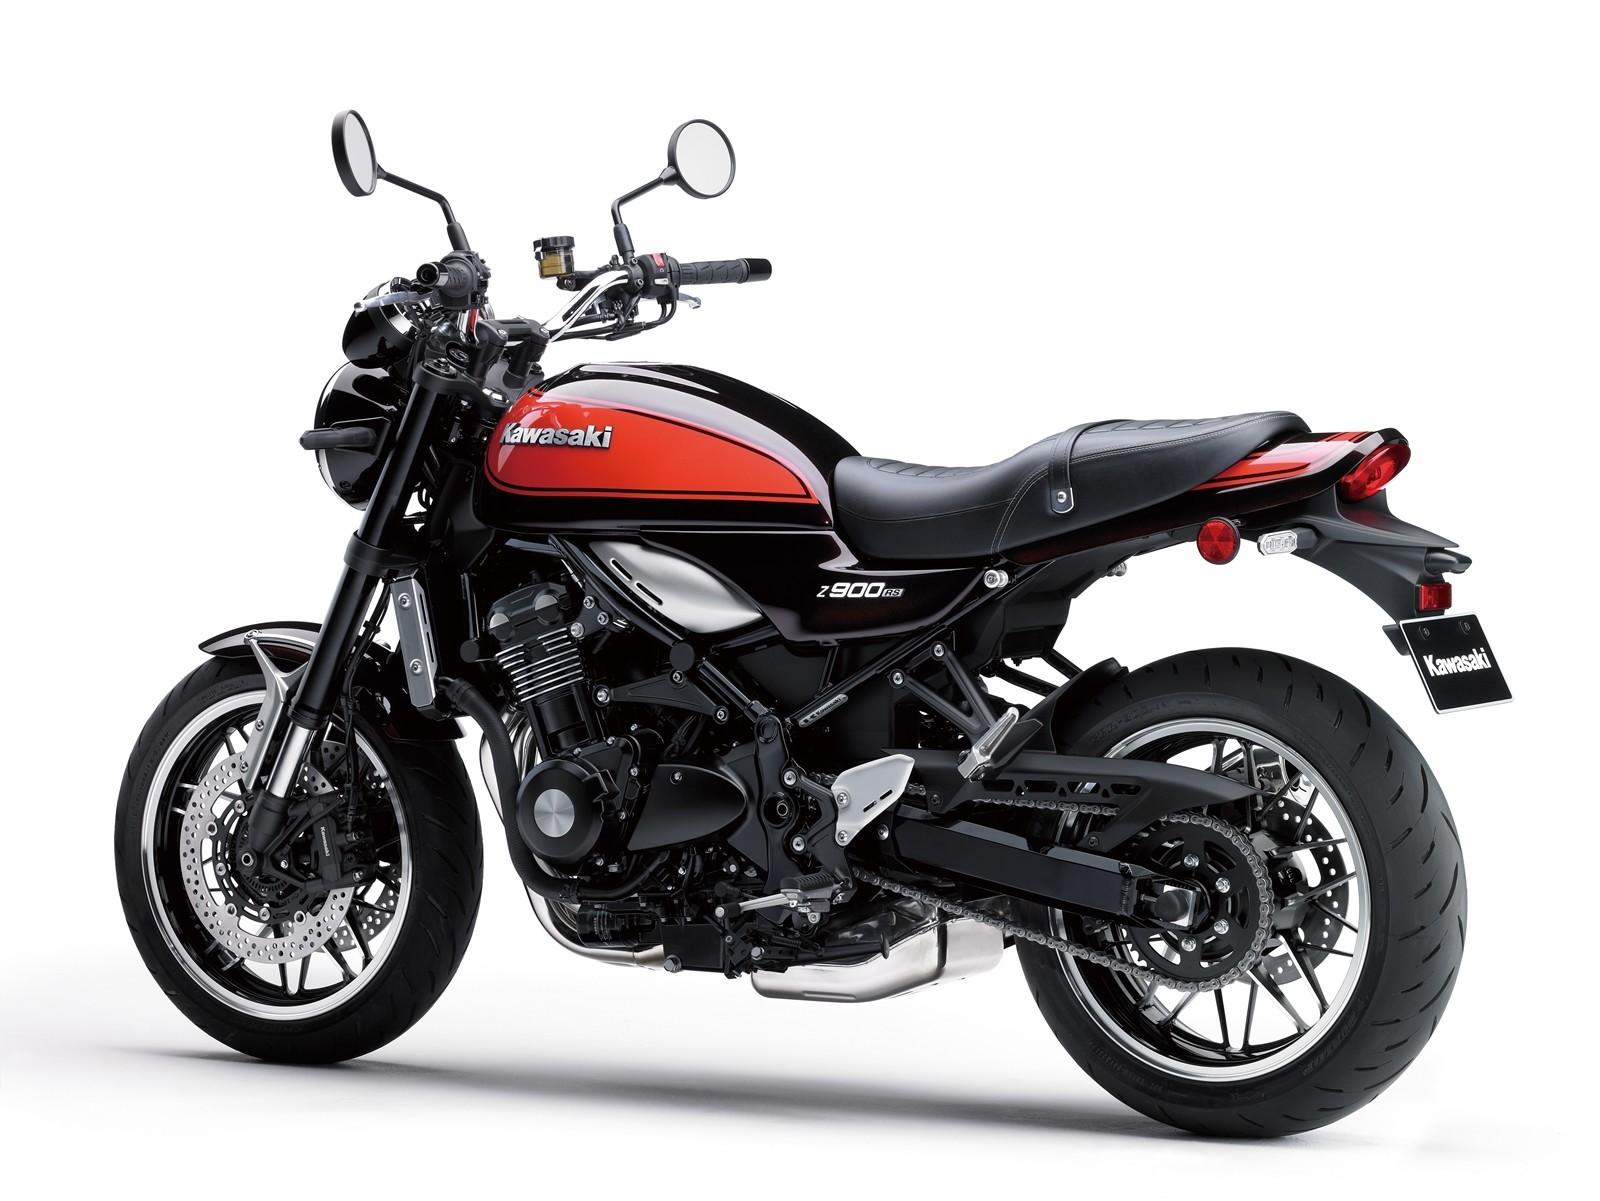 Kawasaki Z900rs Oferta Dm 5